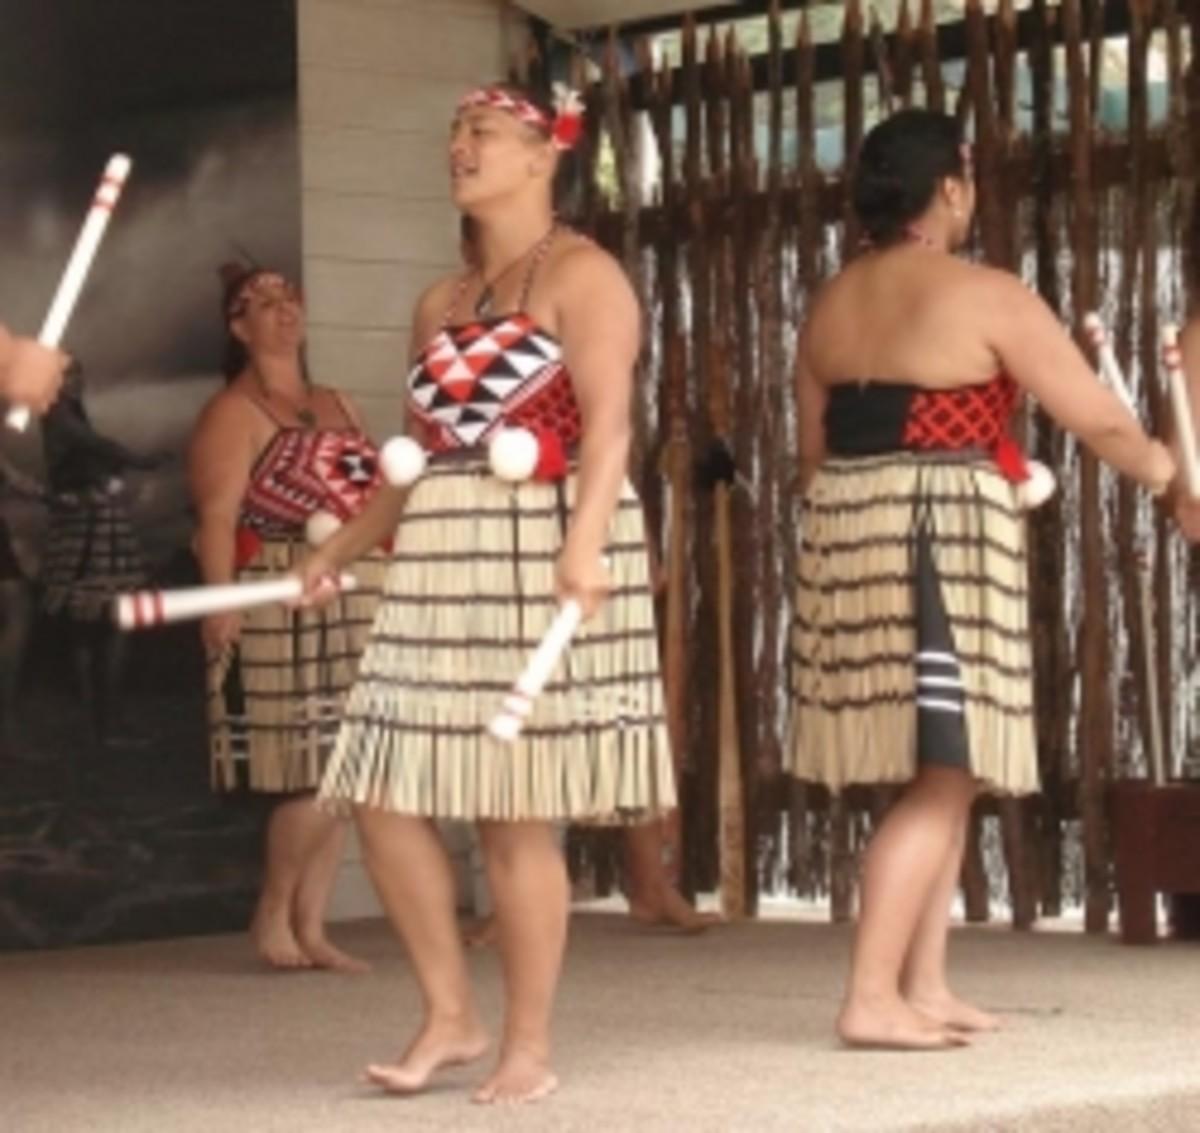 A Maori woman with long sticks.